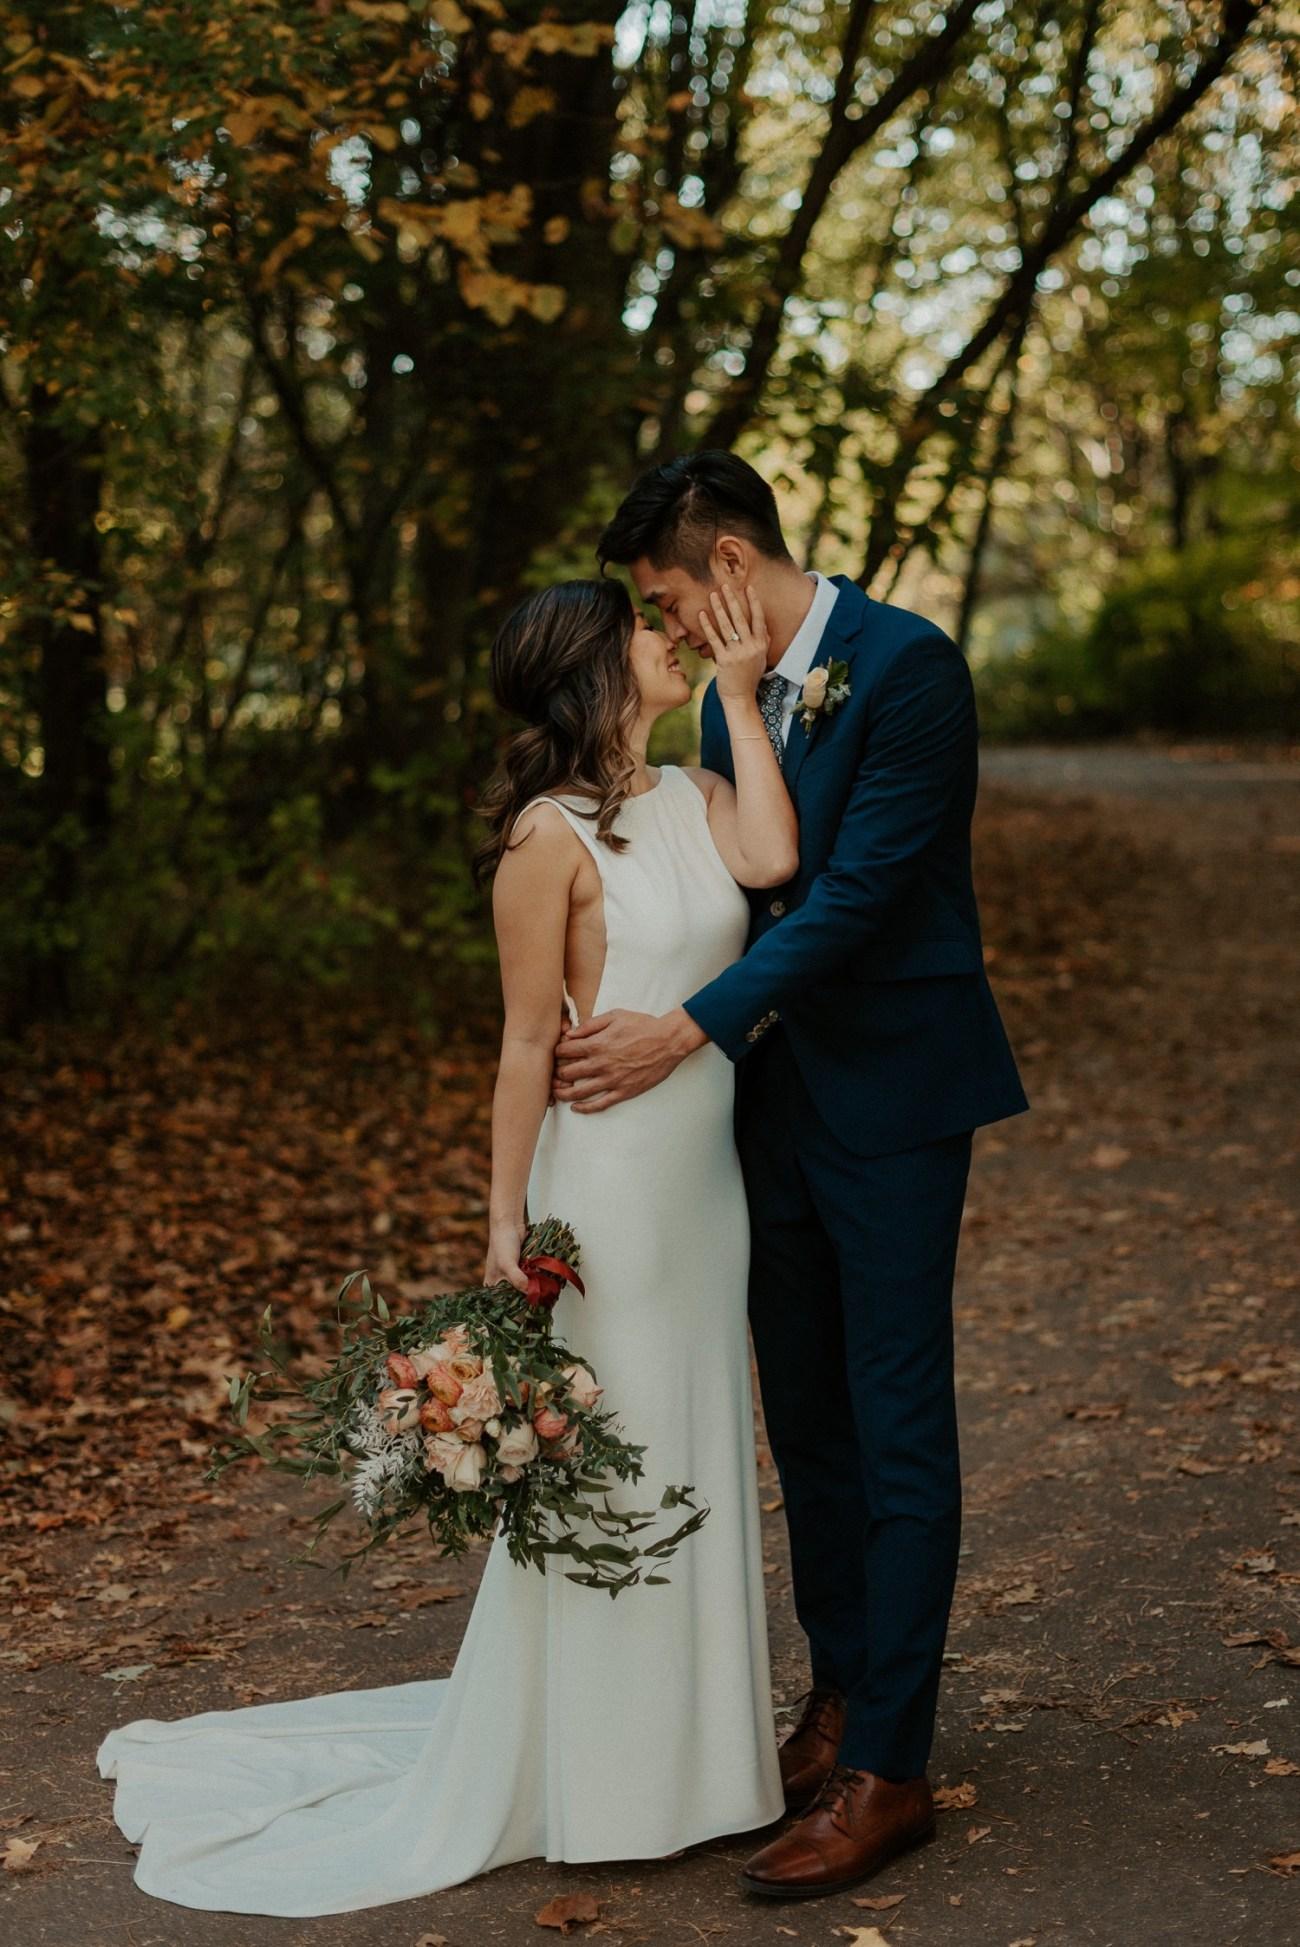 Prospect Park Brooklyn Wedding Fall Wedding In NYC New York Wedding Photographer Anais Possamai Photography 21